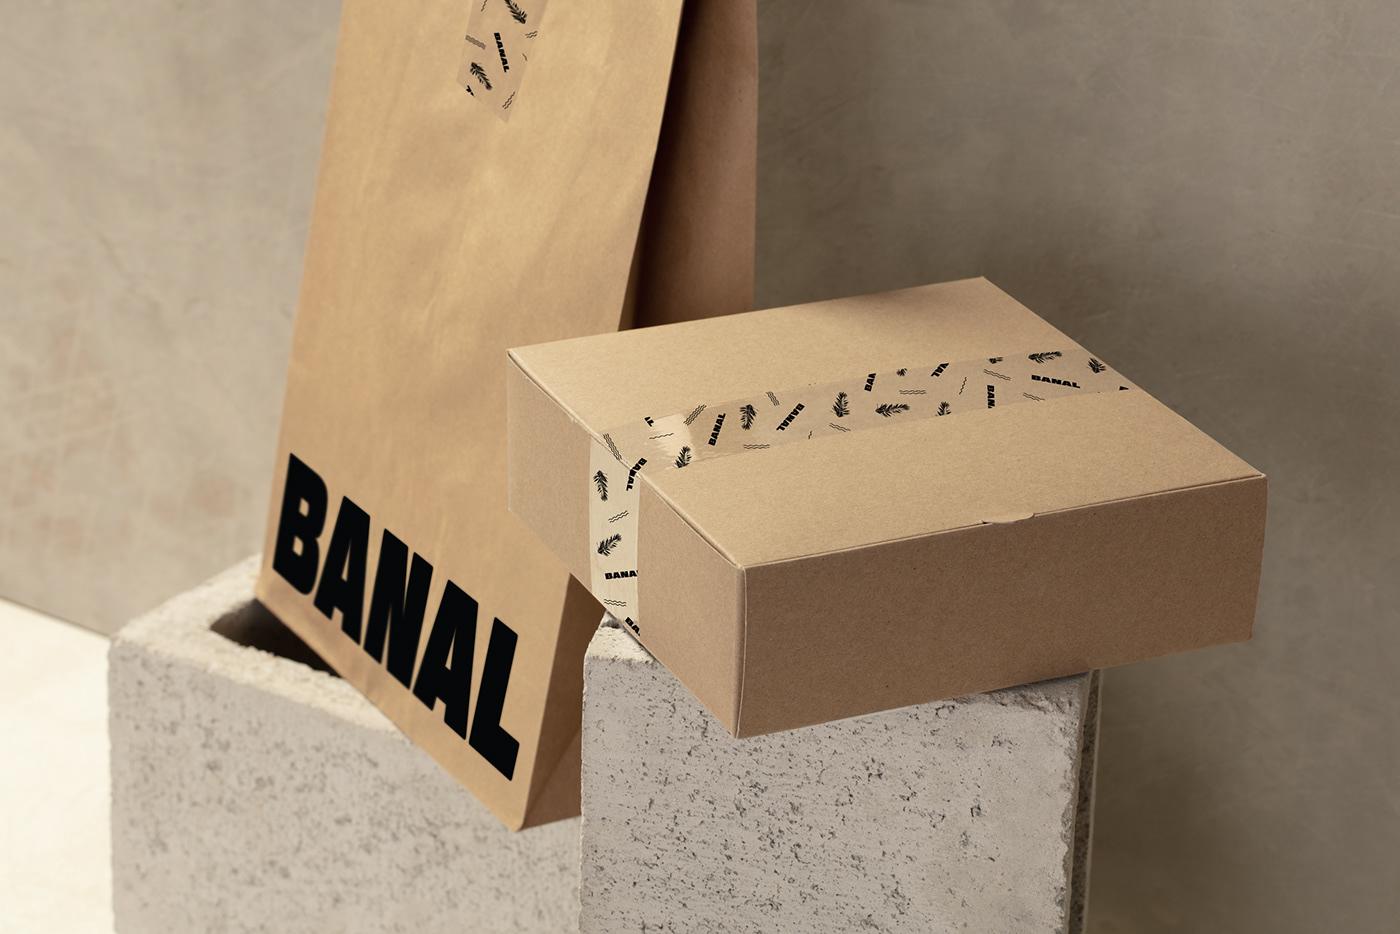 Image may contain: box, indoor and handwriting